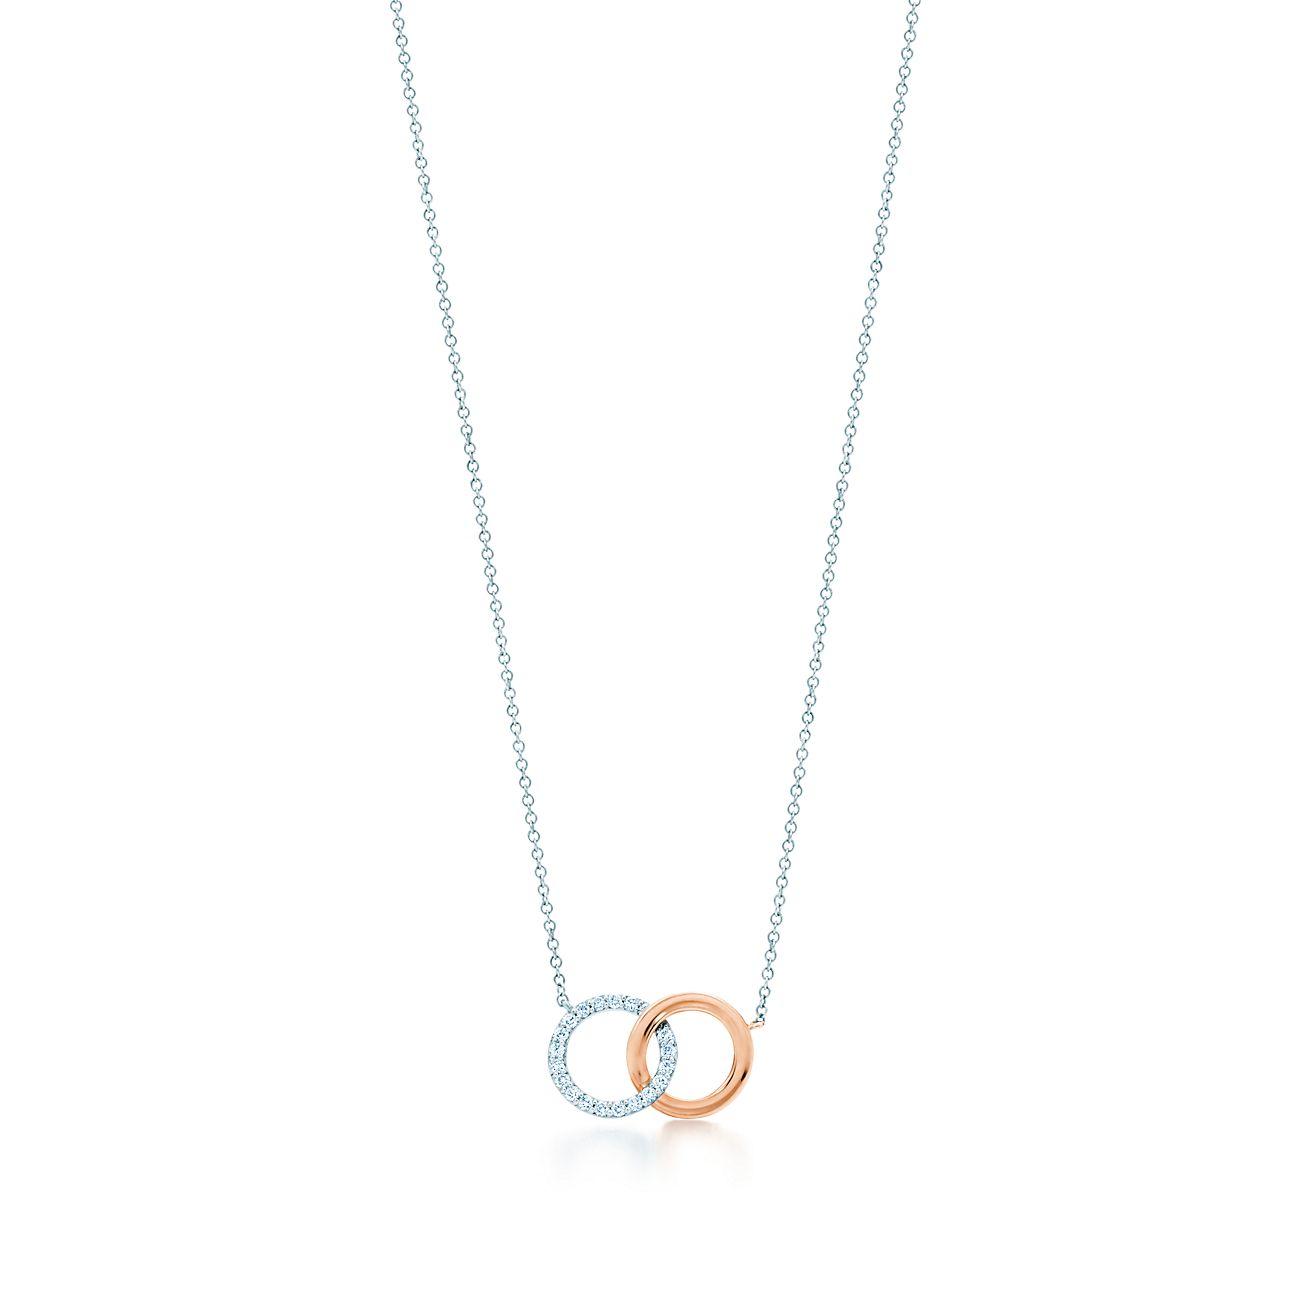 Tiffany 1837 interlocking circles pendant in white and rose gold tiffany 1837double interlocking circles pendant aloadofball Image collections